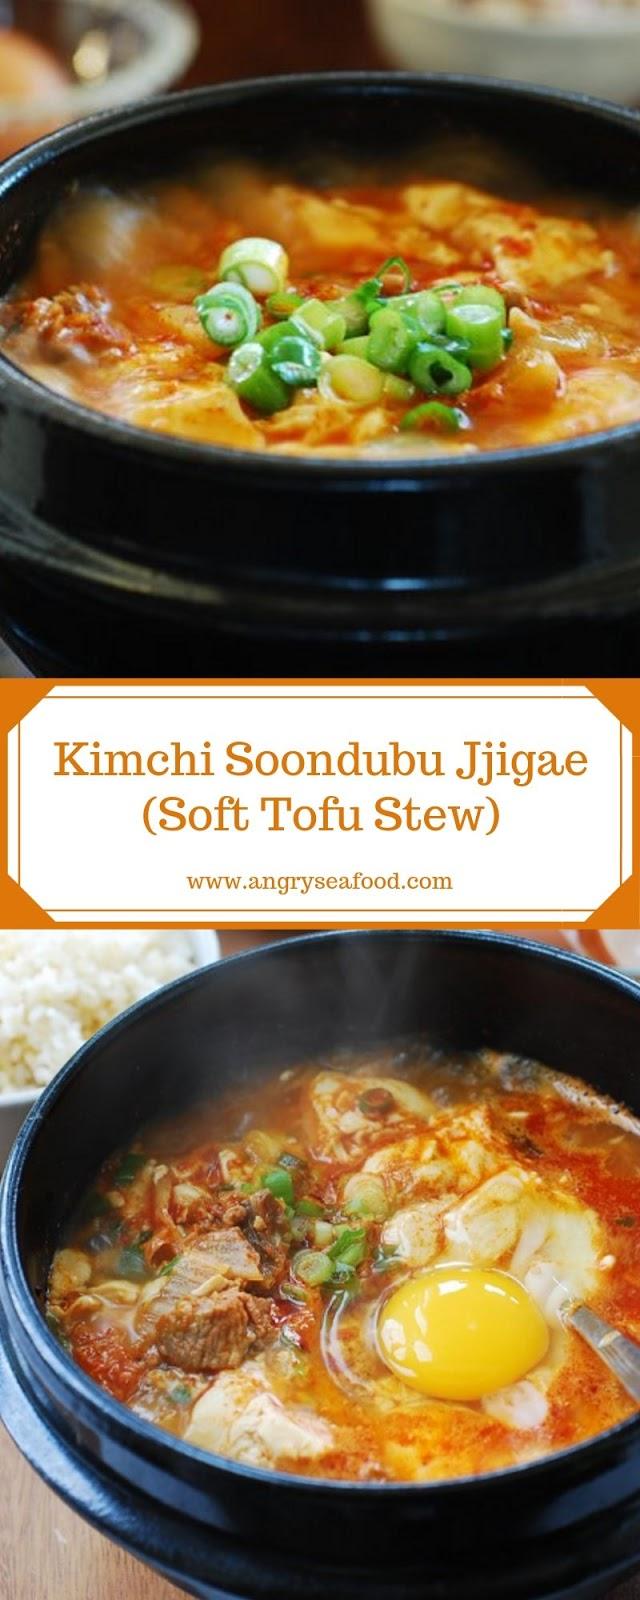 Kimchi Soondubu Jjigae (Soft Tofu Stew)